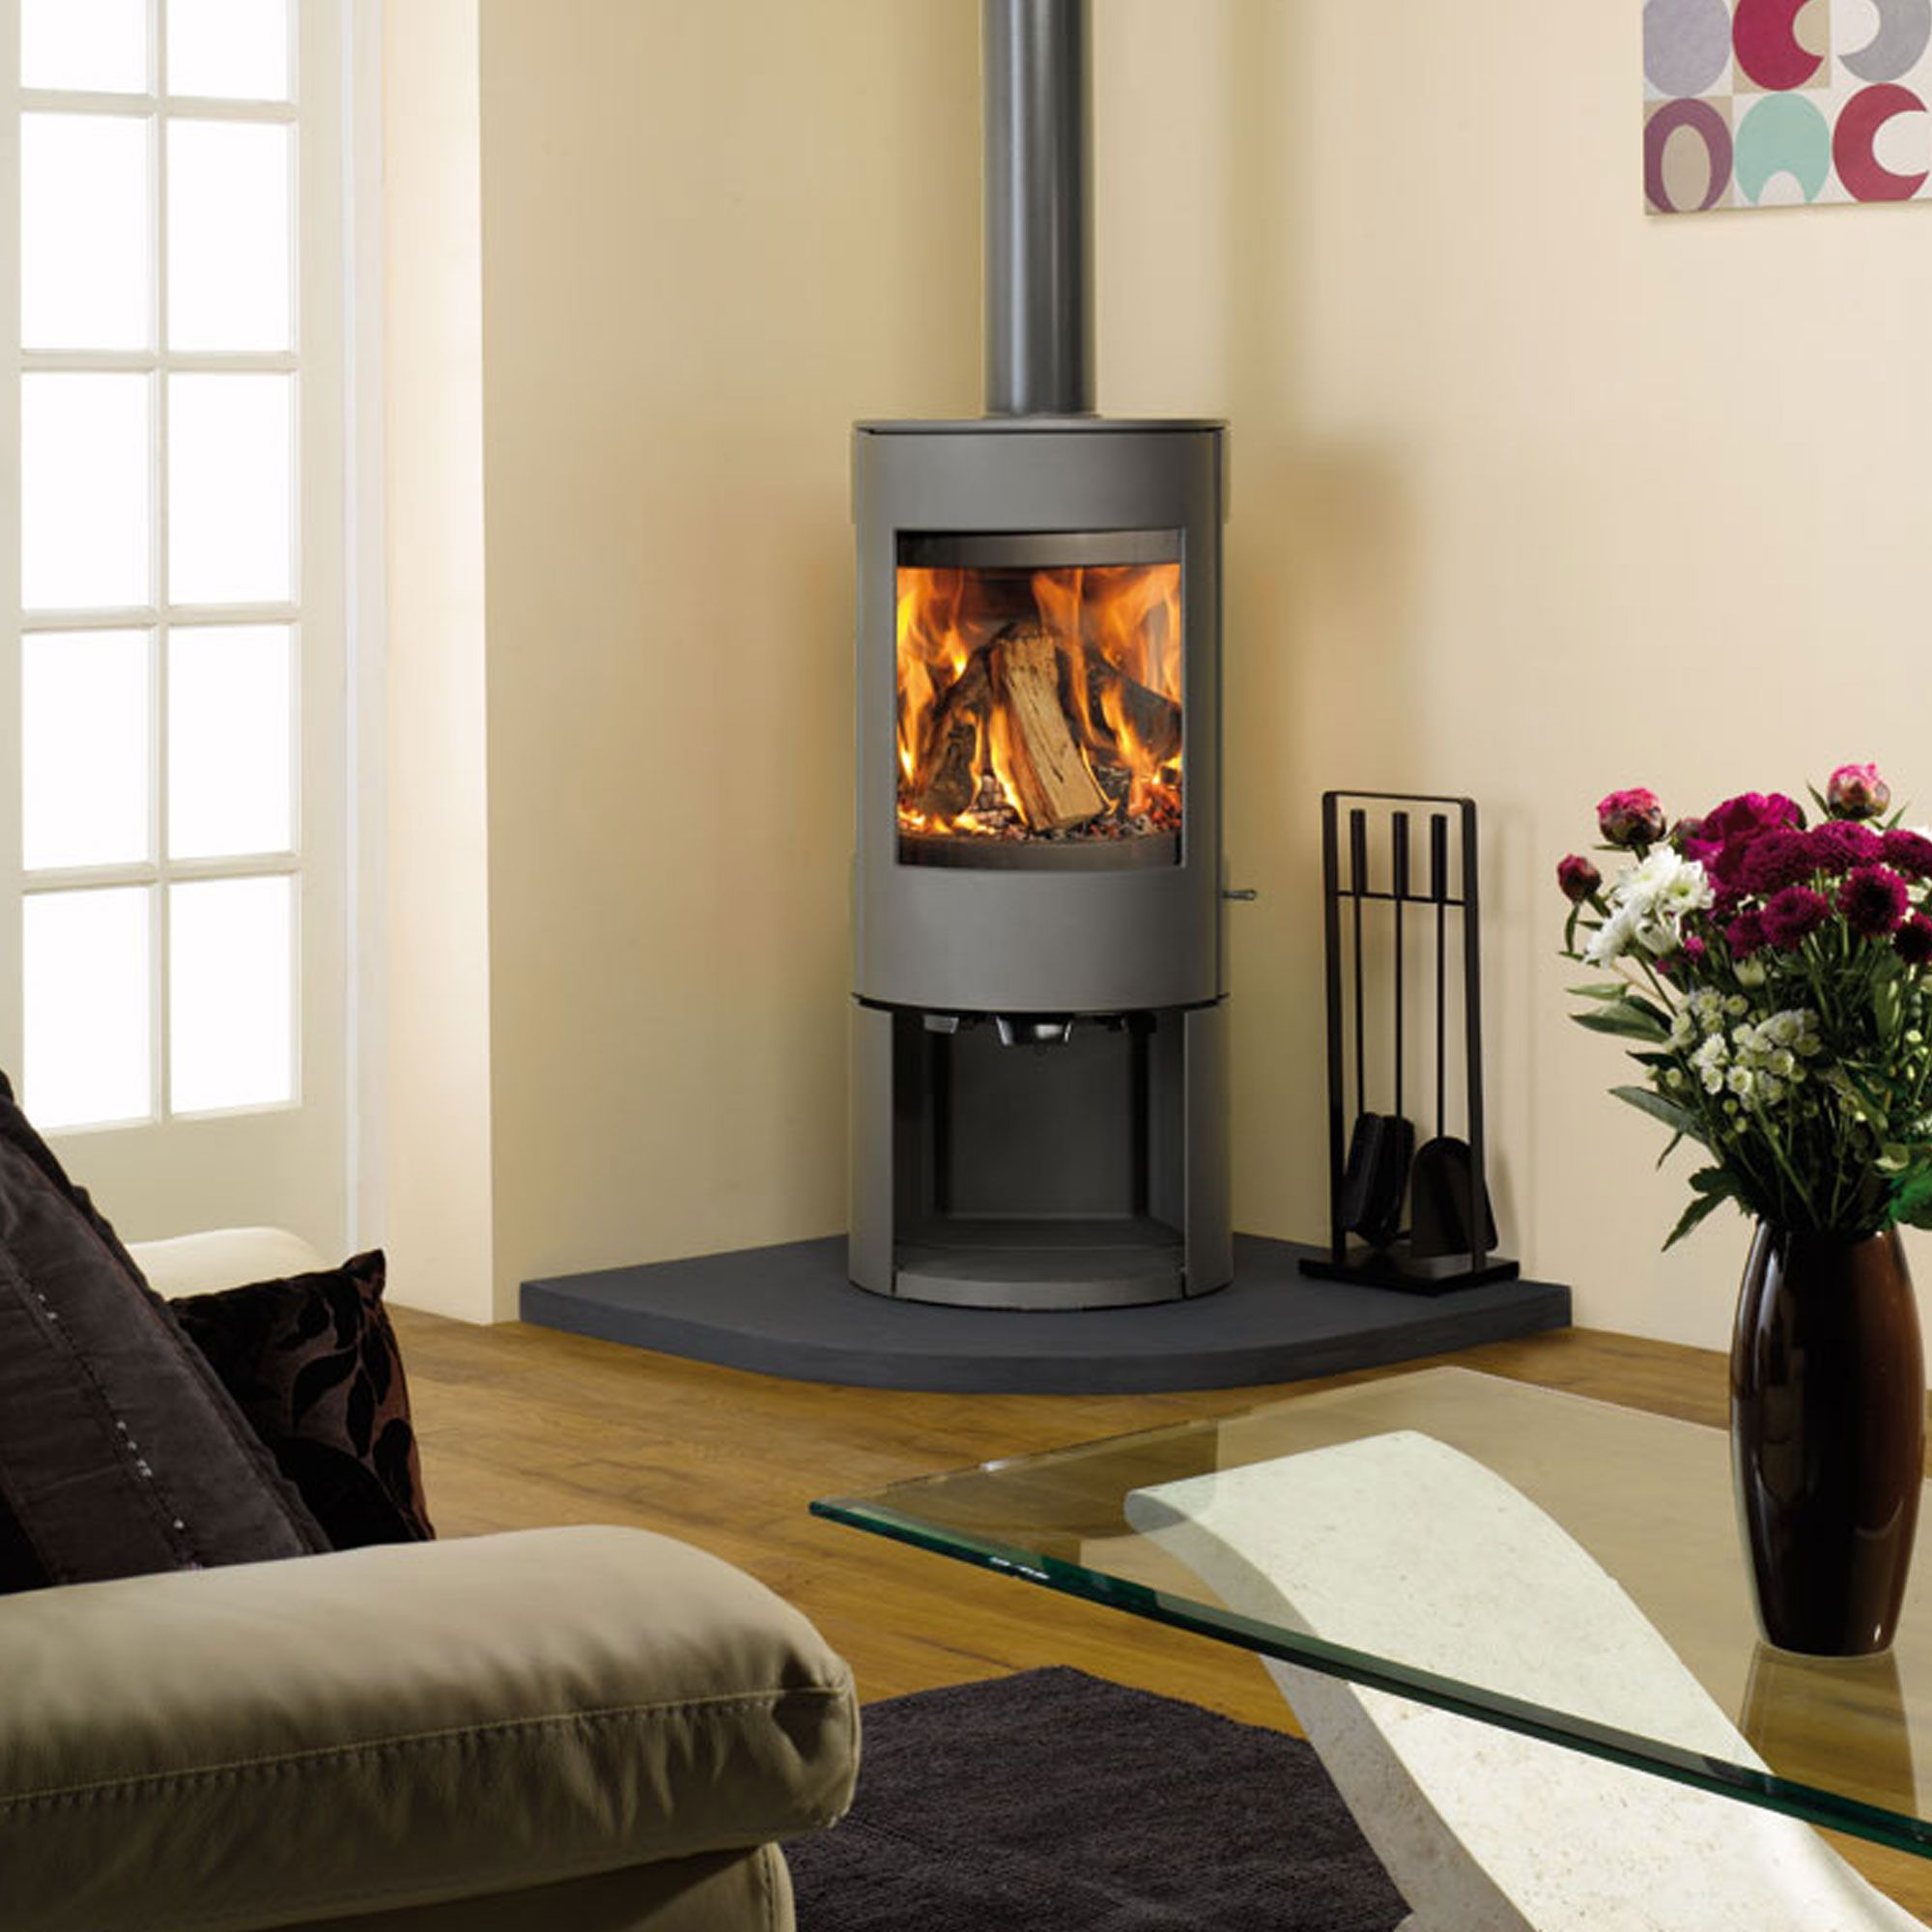 Dovre Astroline 3cb A Bell Fires Stoves Multi Fuel Wood Burning Stoves Living Room Wood Burning Stove Corner Wood Burning Stove Decor